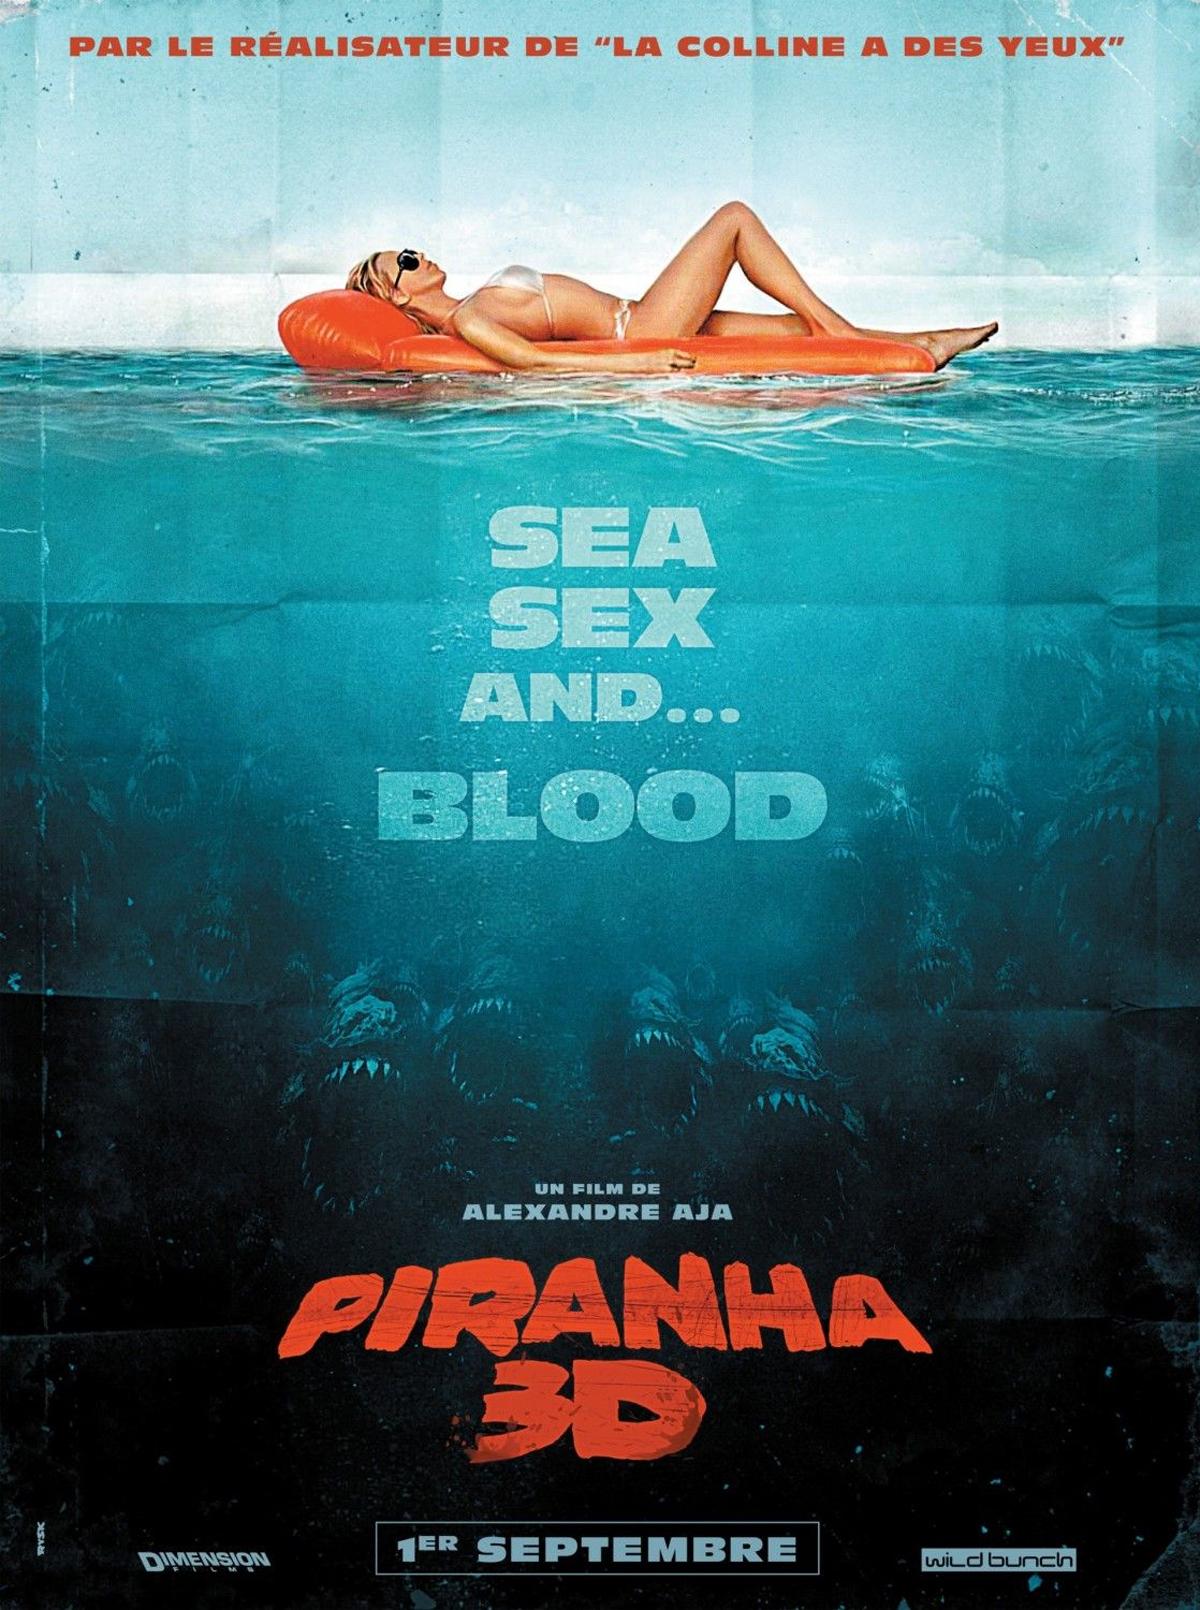 The new movie piranha 3d